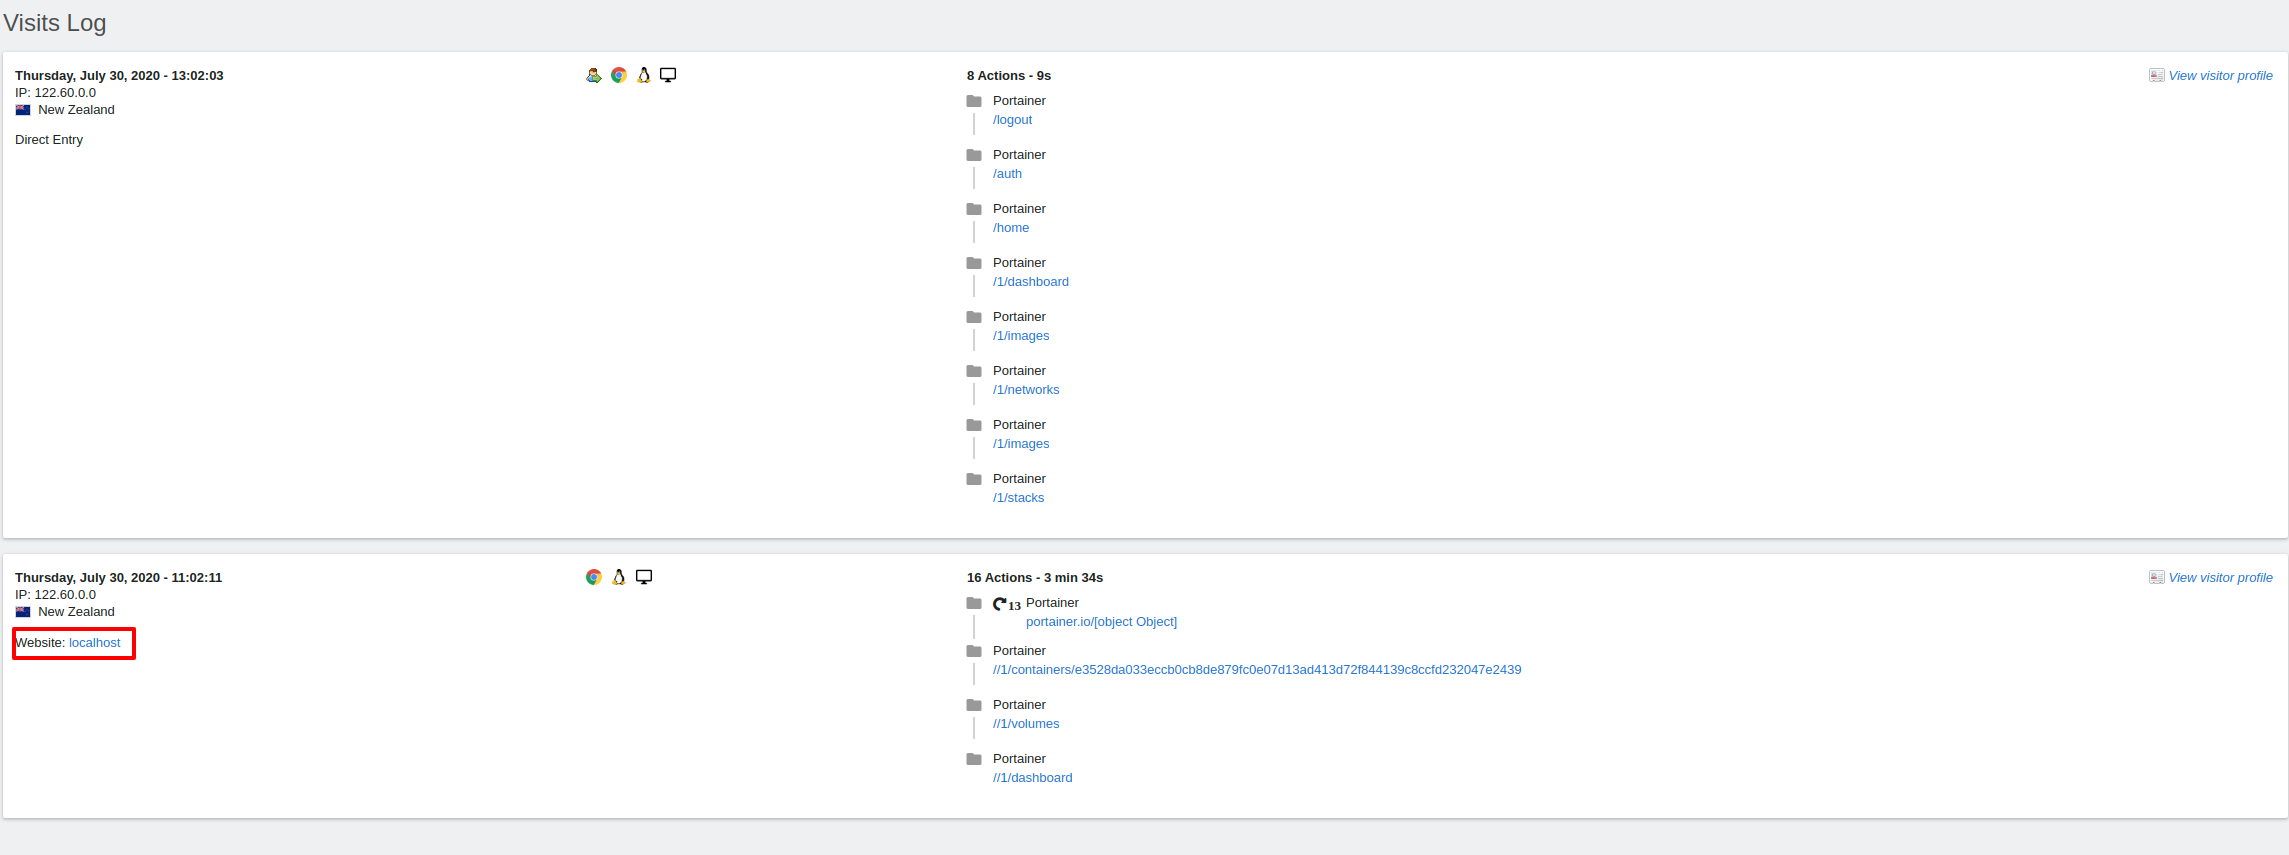 portainer-app-2020-07-30-Web-Analytics-Reports-Matomo (1)